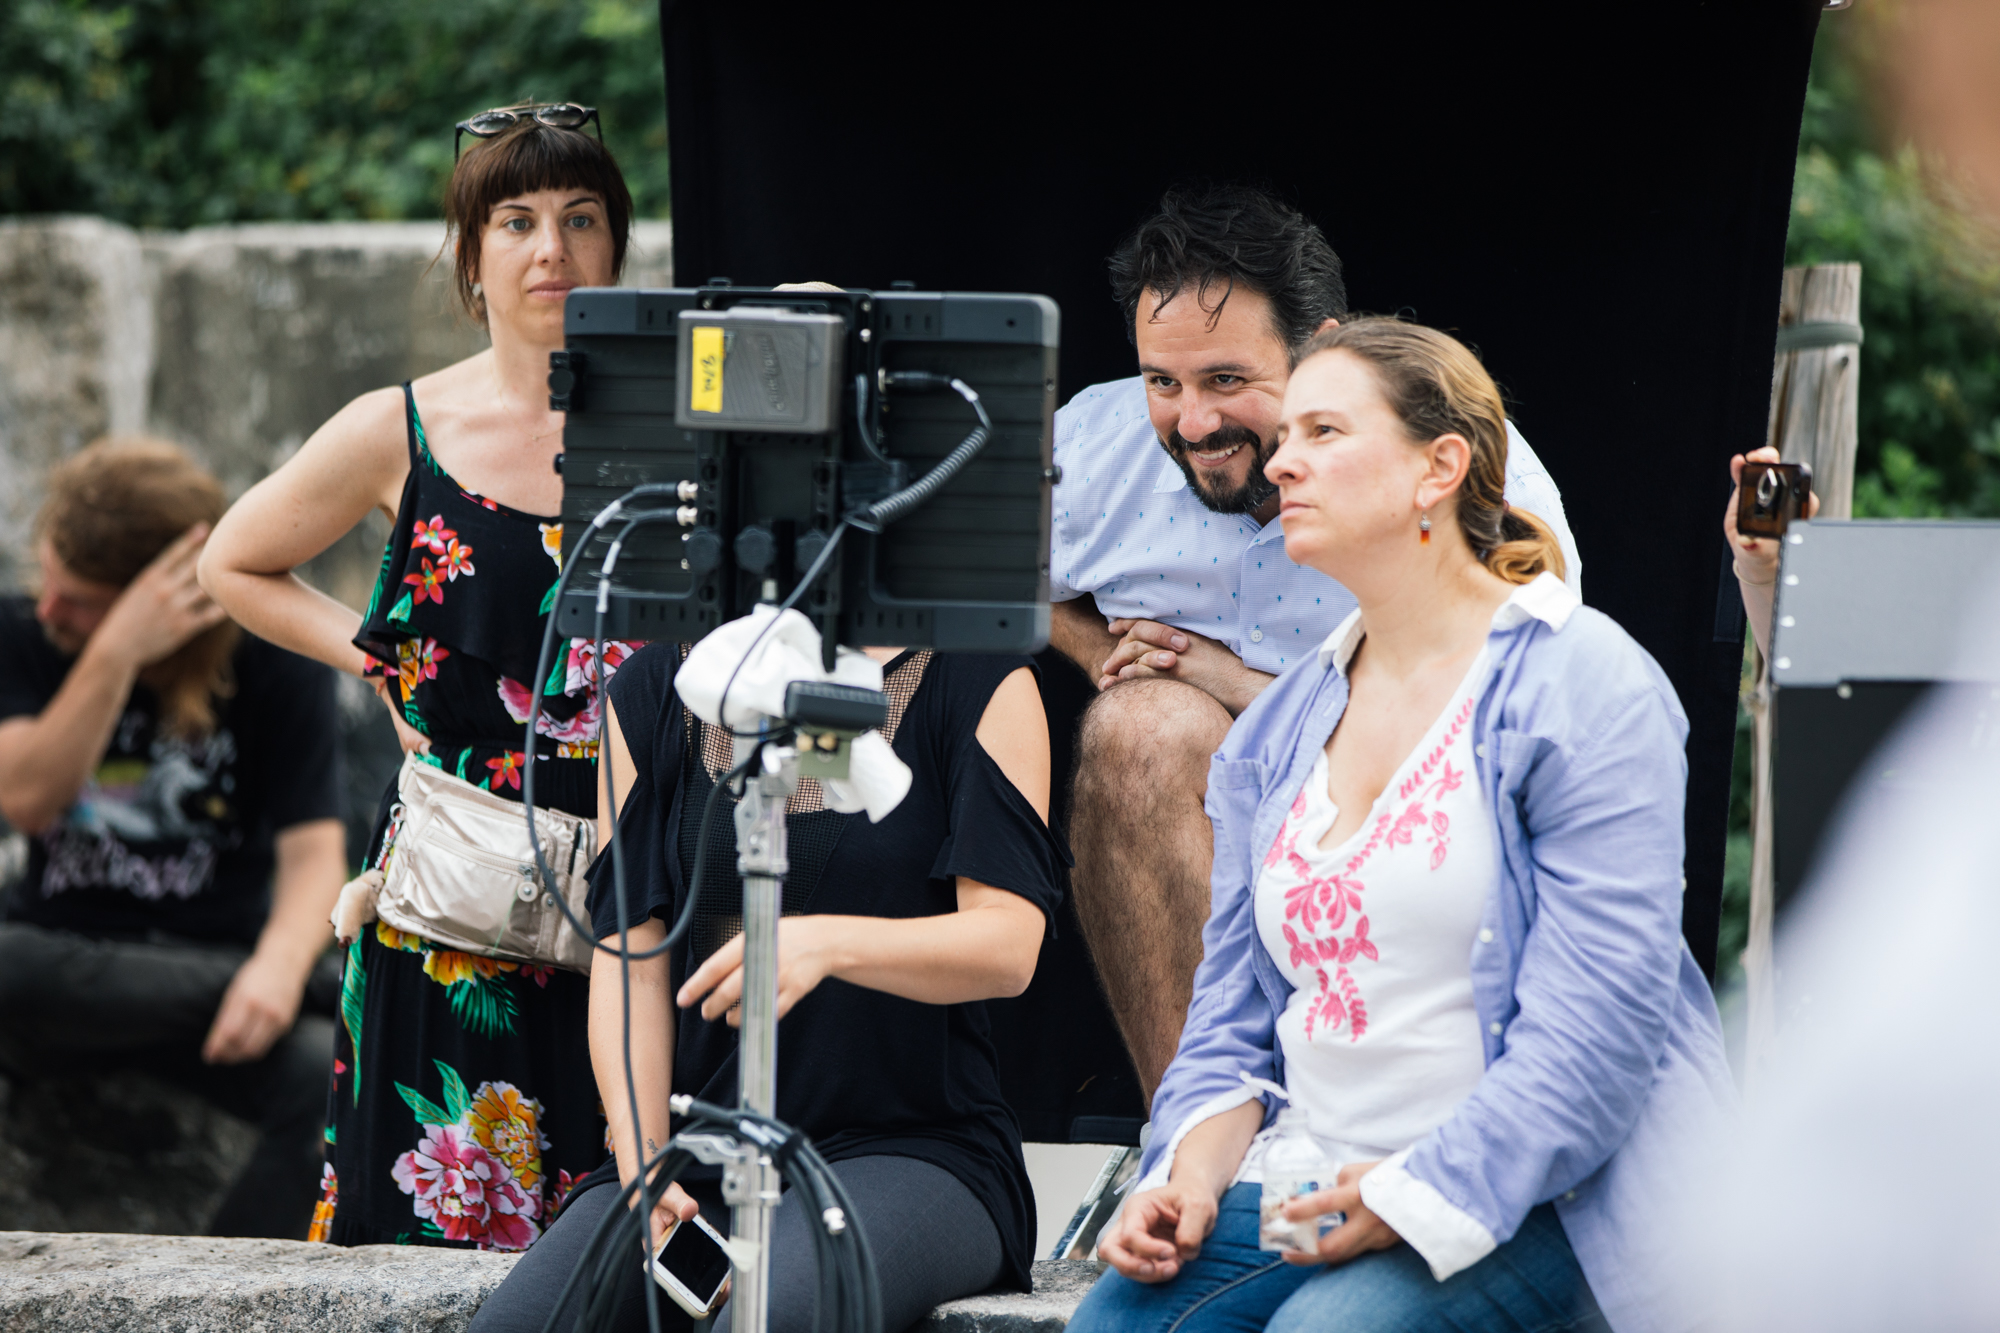 The Way It Begins - Behind the Scenes